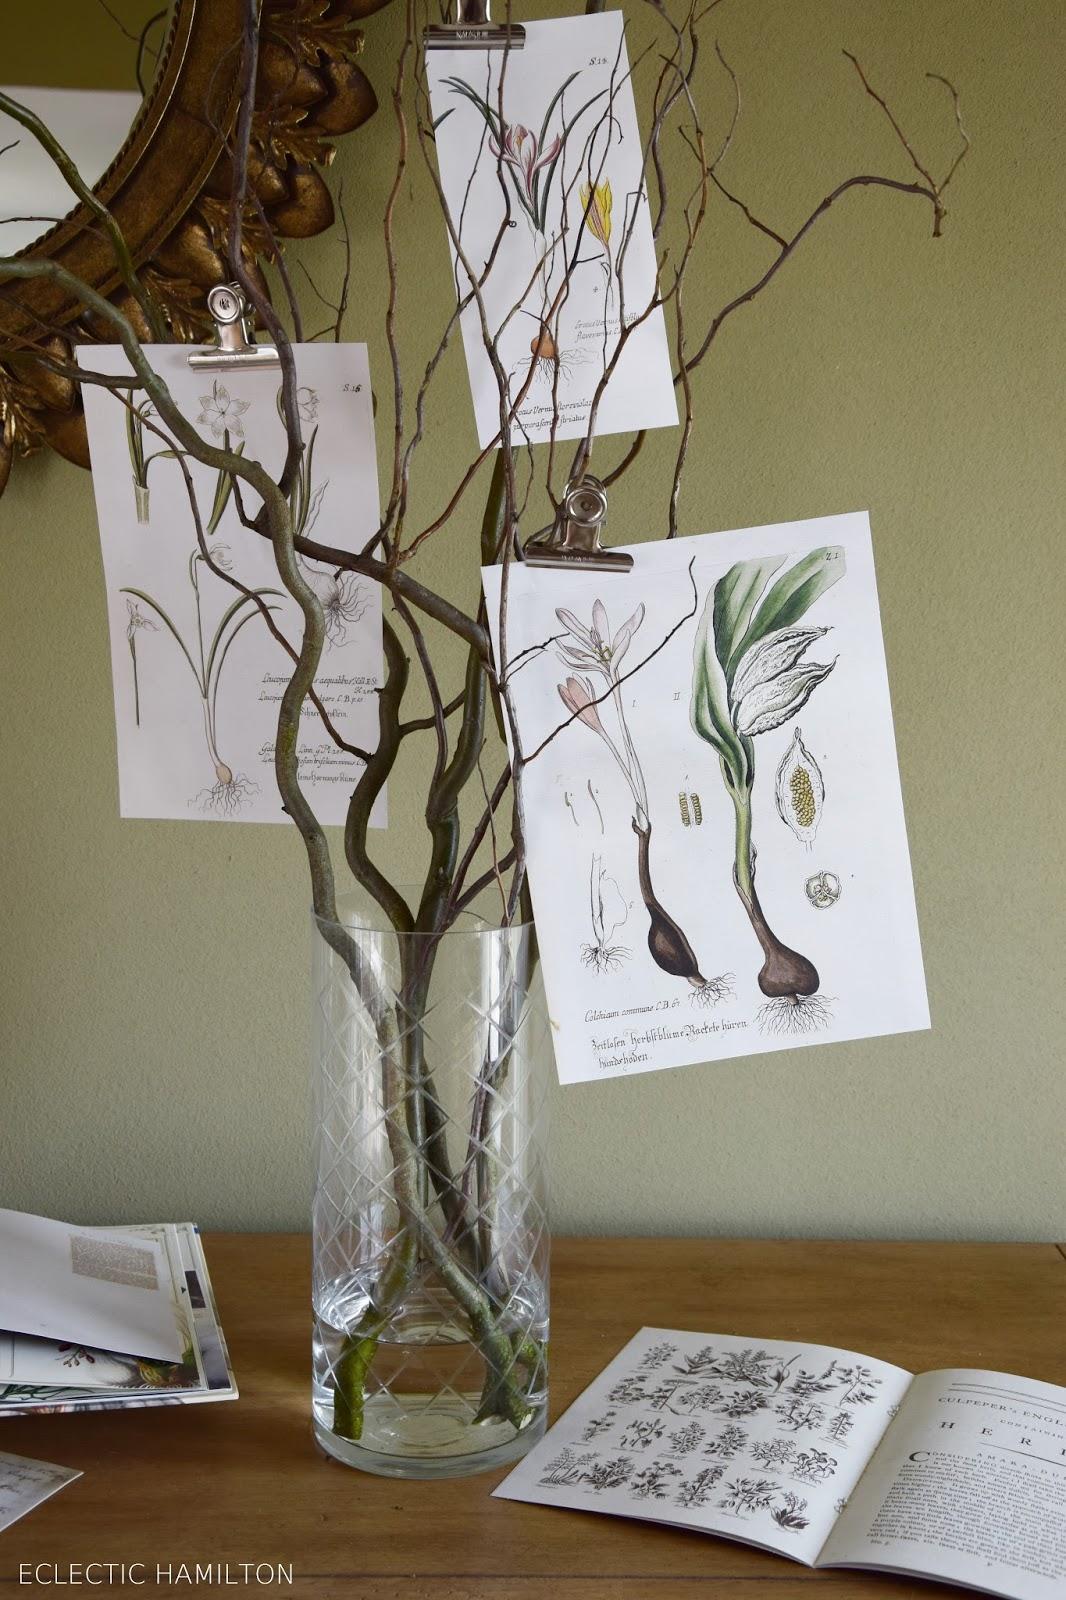 diy-wanddeko-kalenderblatt-brief-maul-klemme-selbstgemacht-deko-dekoration-wand